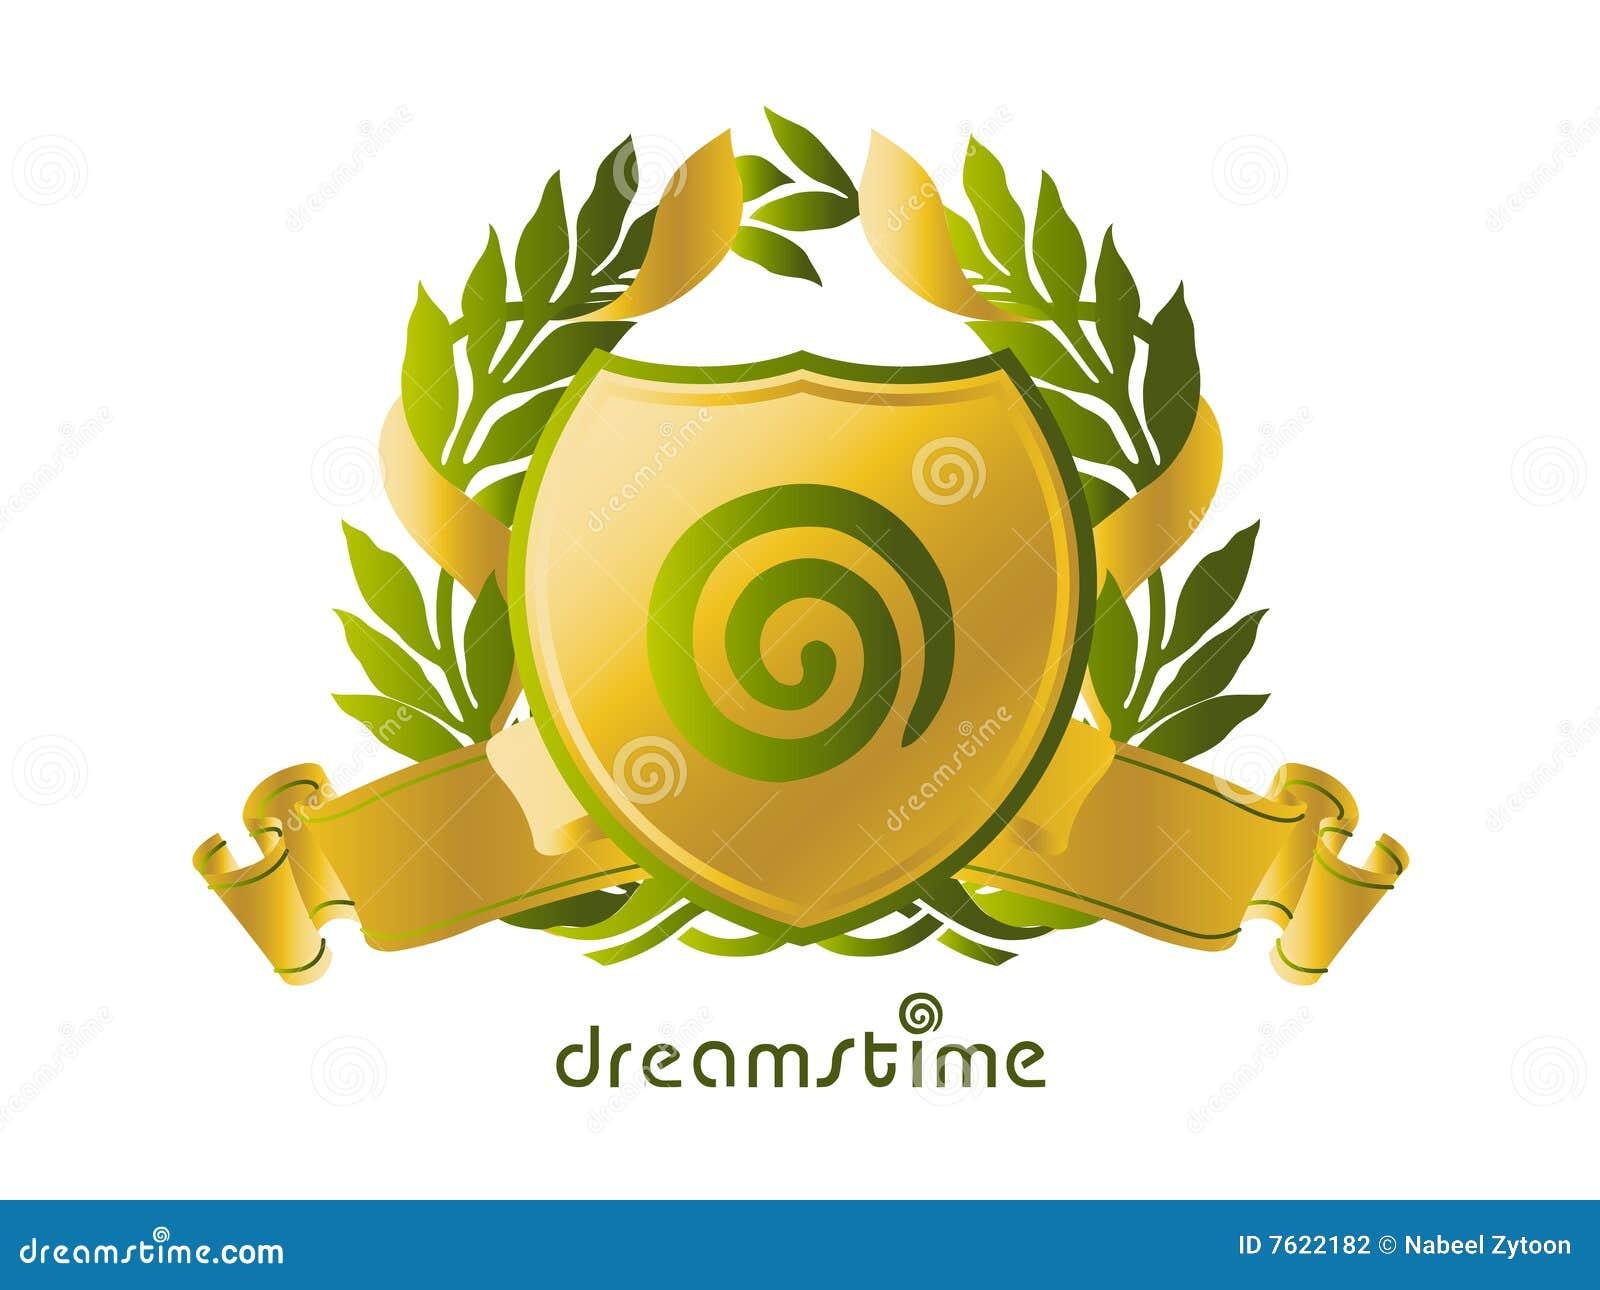 Dreamstime想法徽标